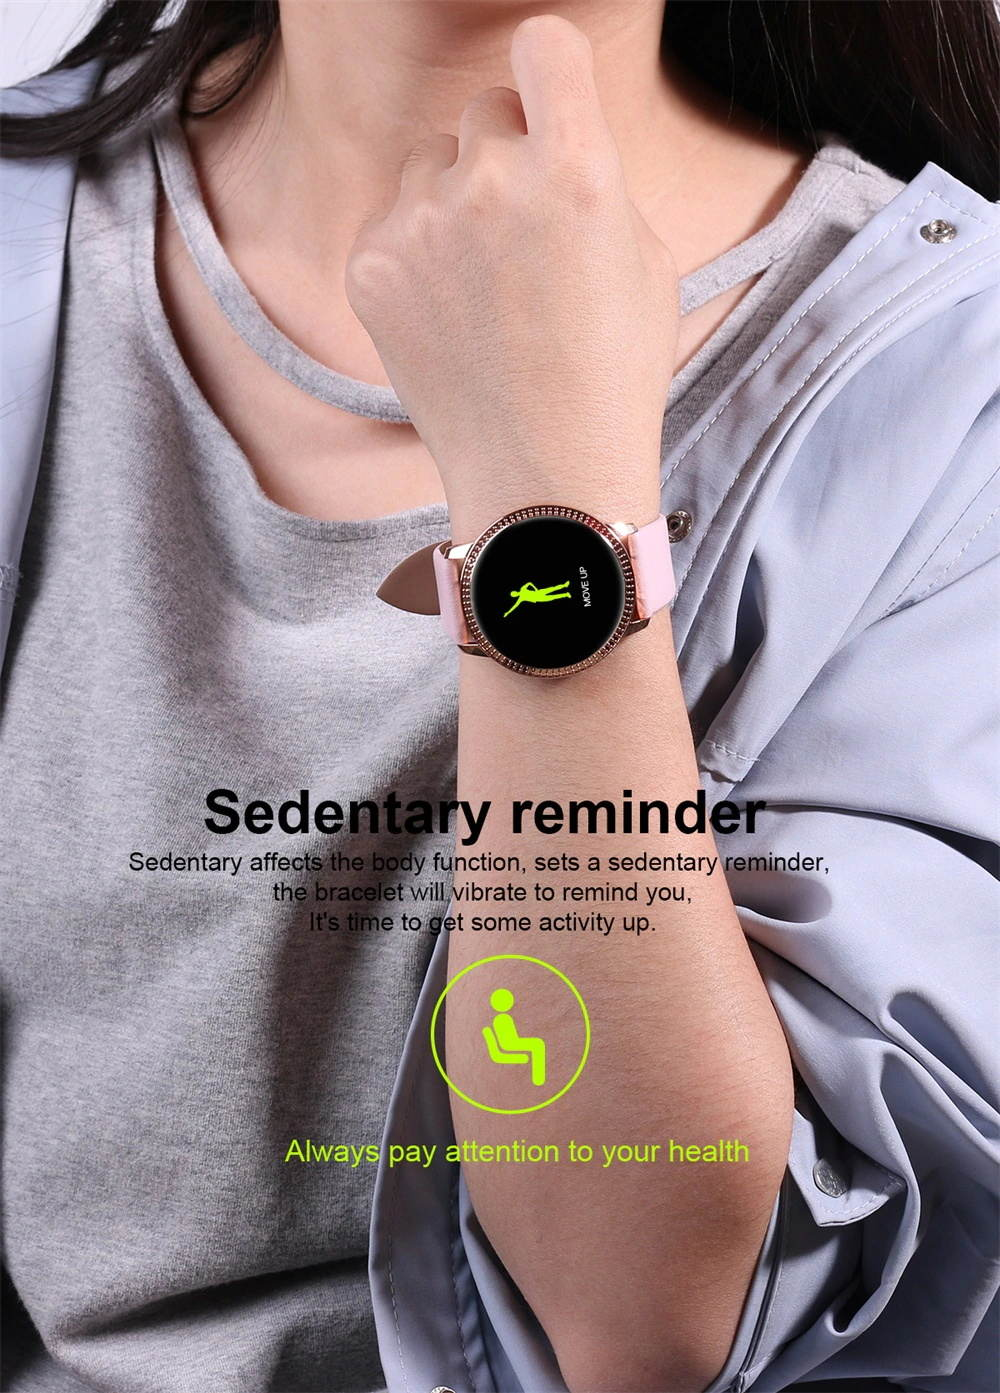 best cf18 sports smartwatch